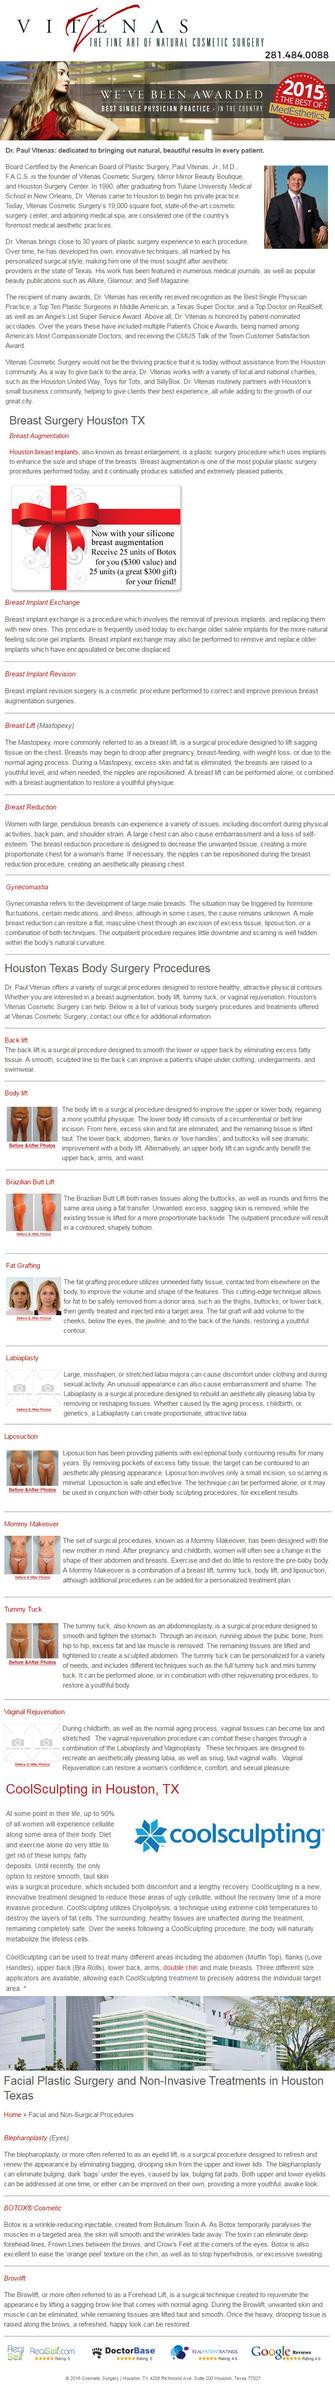 Drvitenas Infographics by christianesherard275